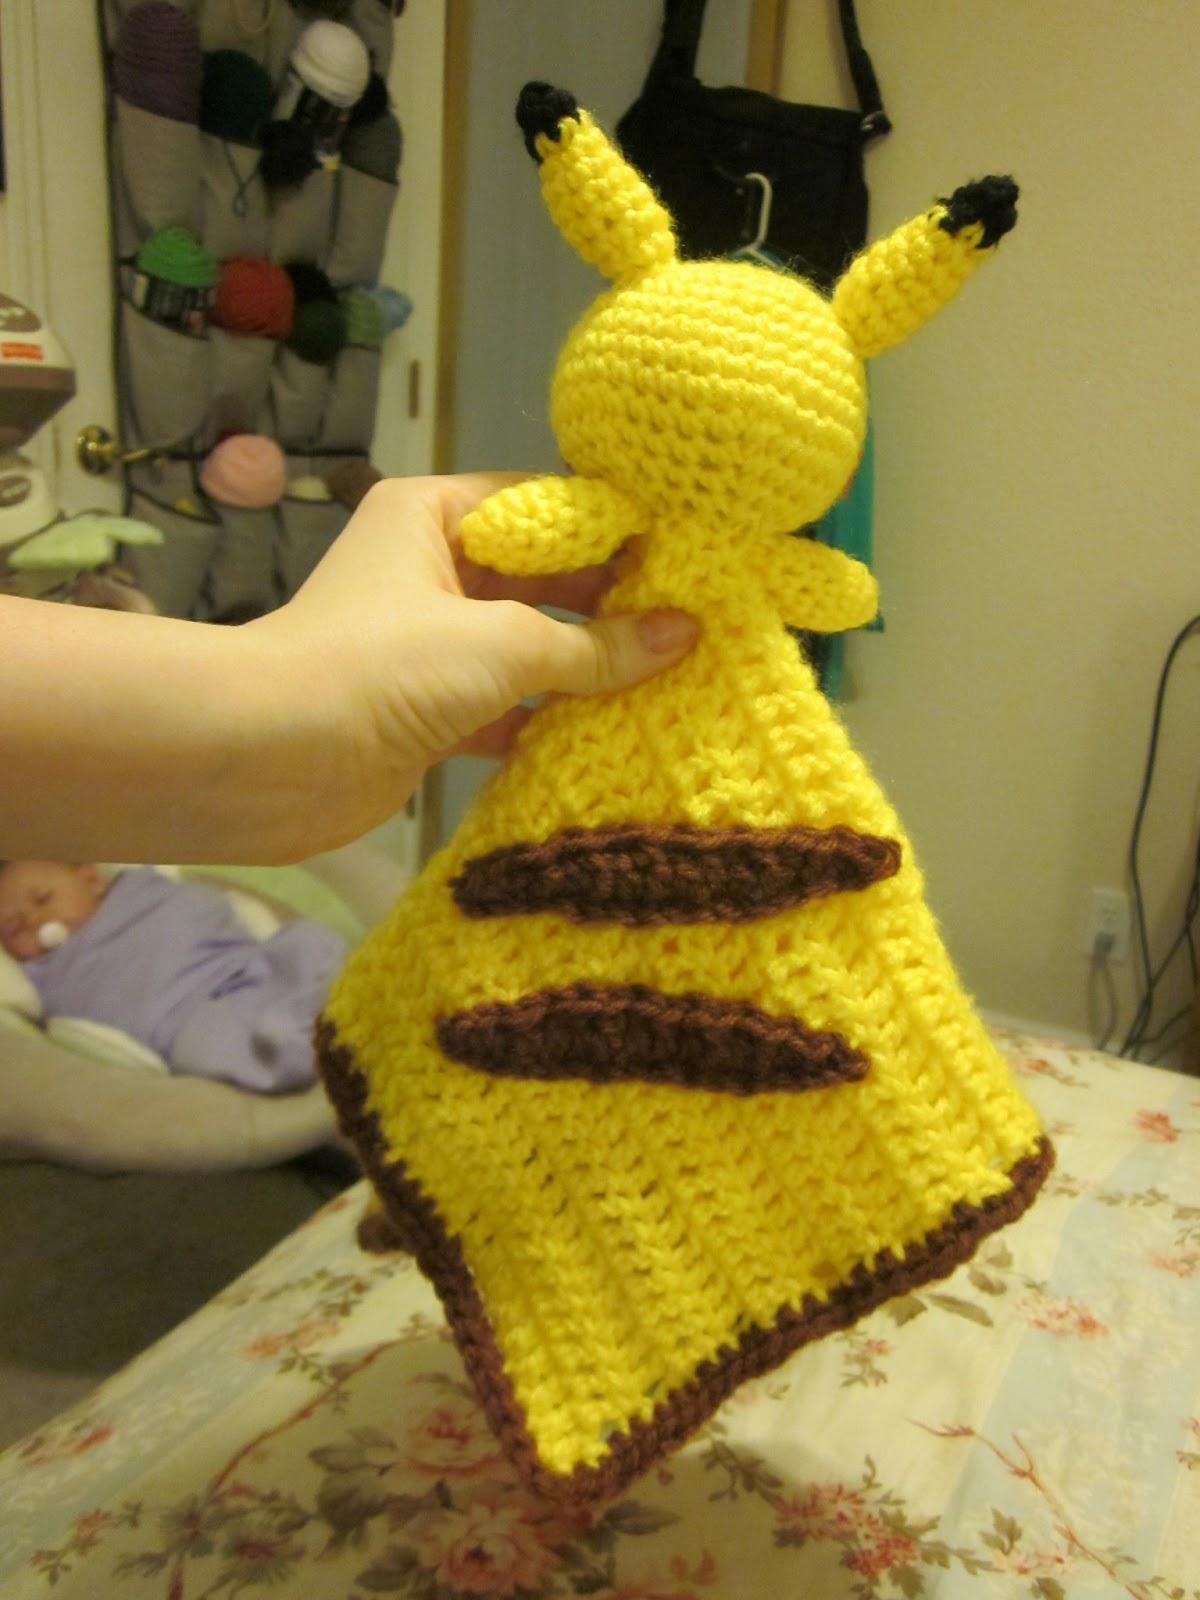 Nyan Cat Lovey Crochet Pattern Download | Etsy | 1600x1200